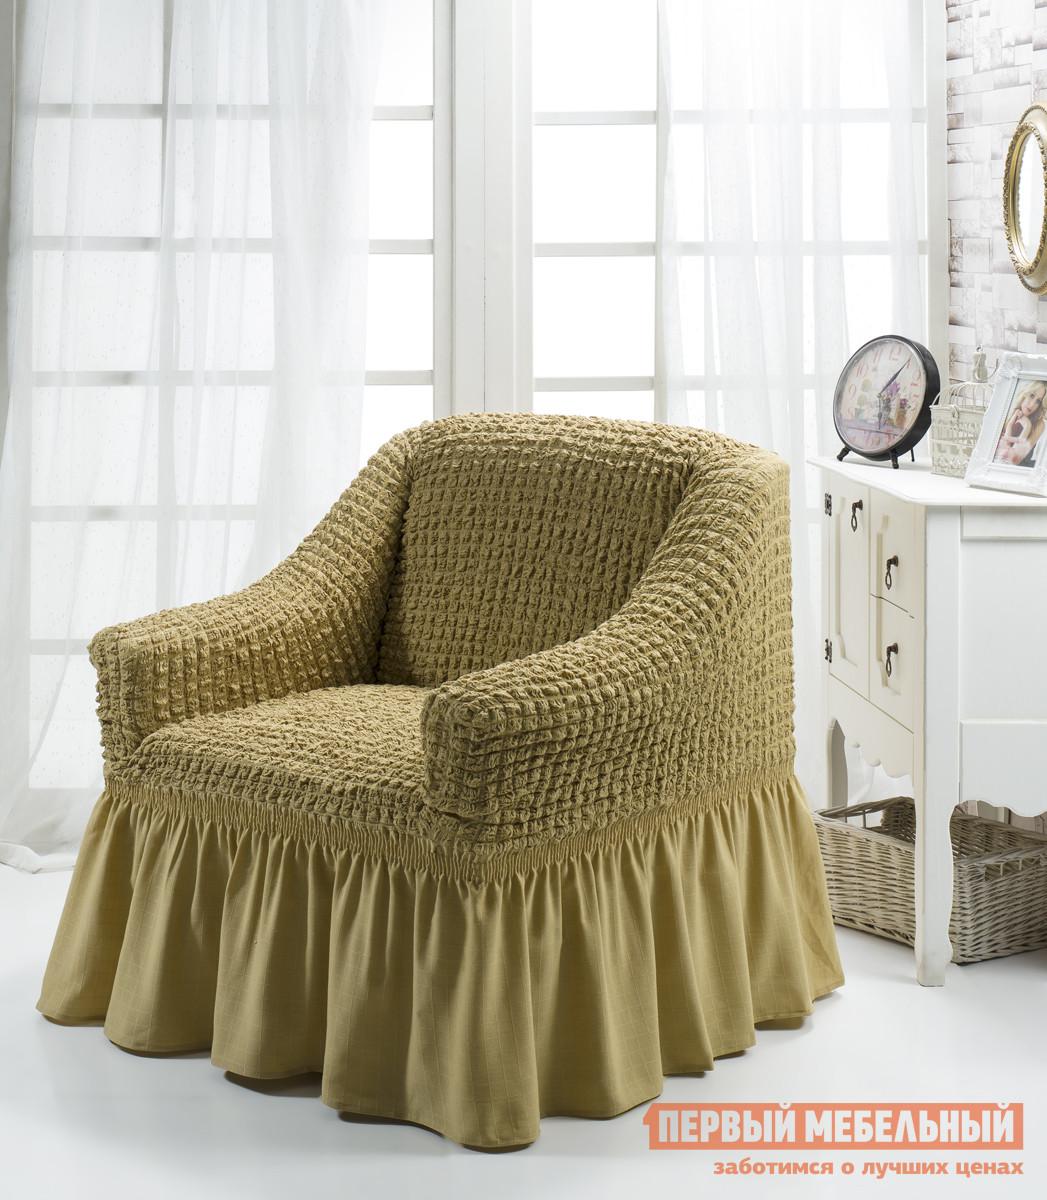 Чехол для мебели  кресла Стамбул Бежевый KARNA 83580